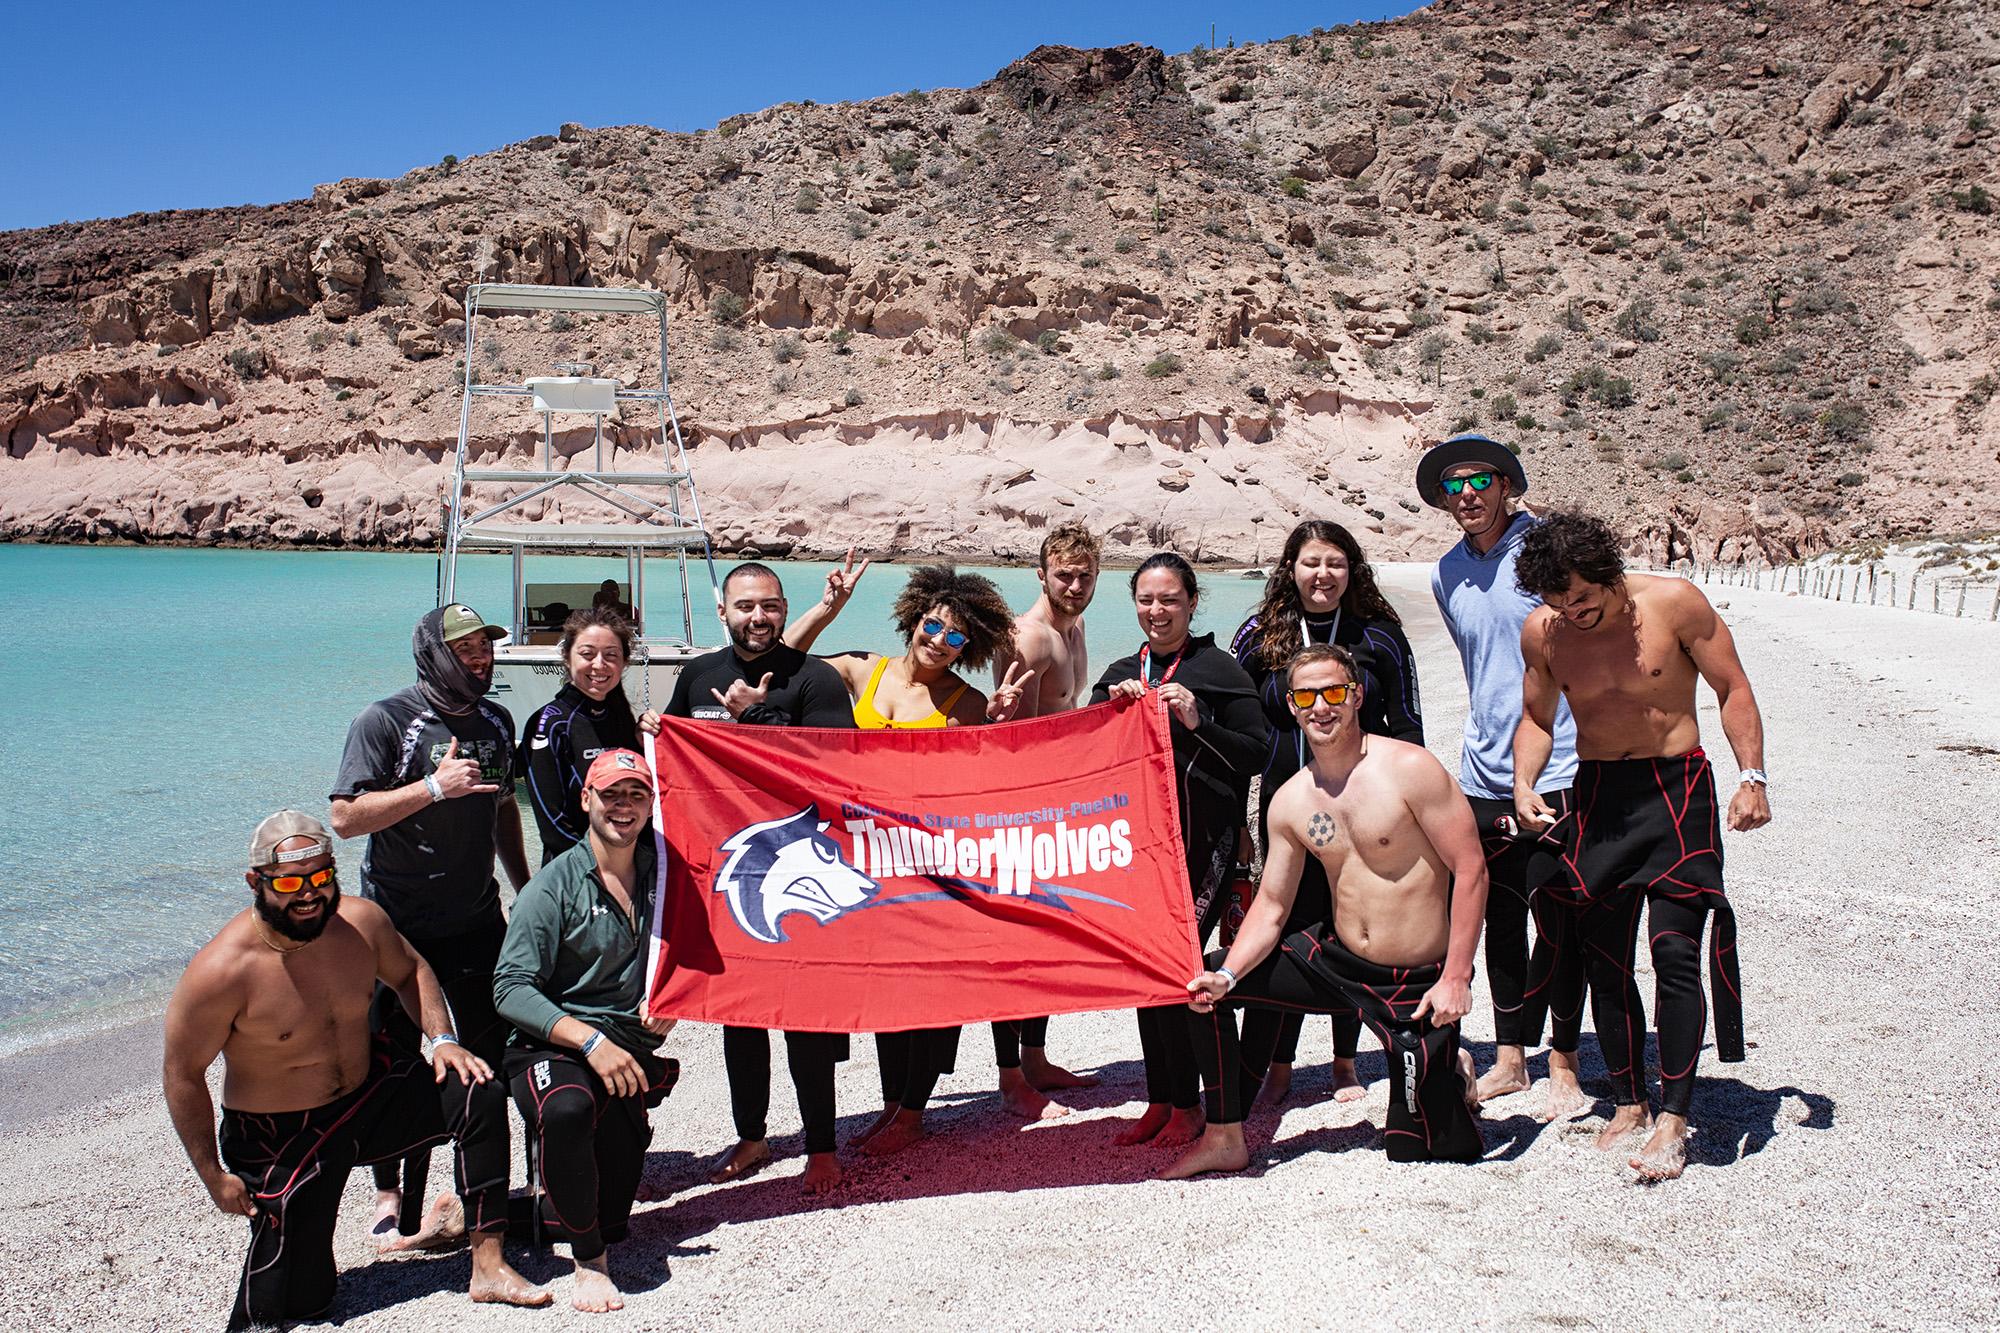 CSU-Pueblo students on beach at Baja California Sur